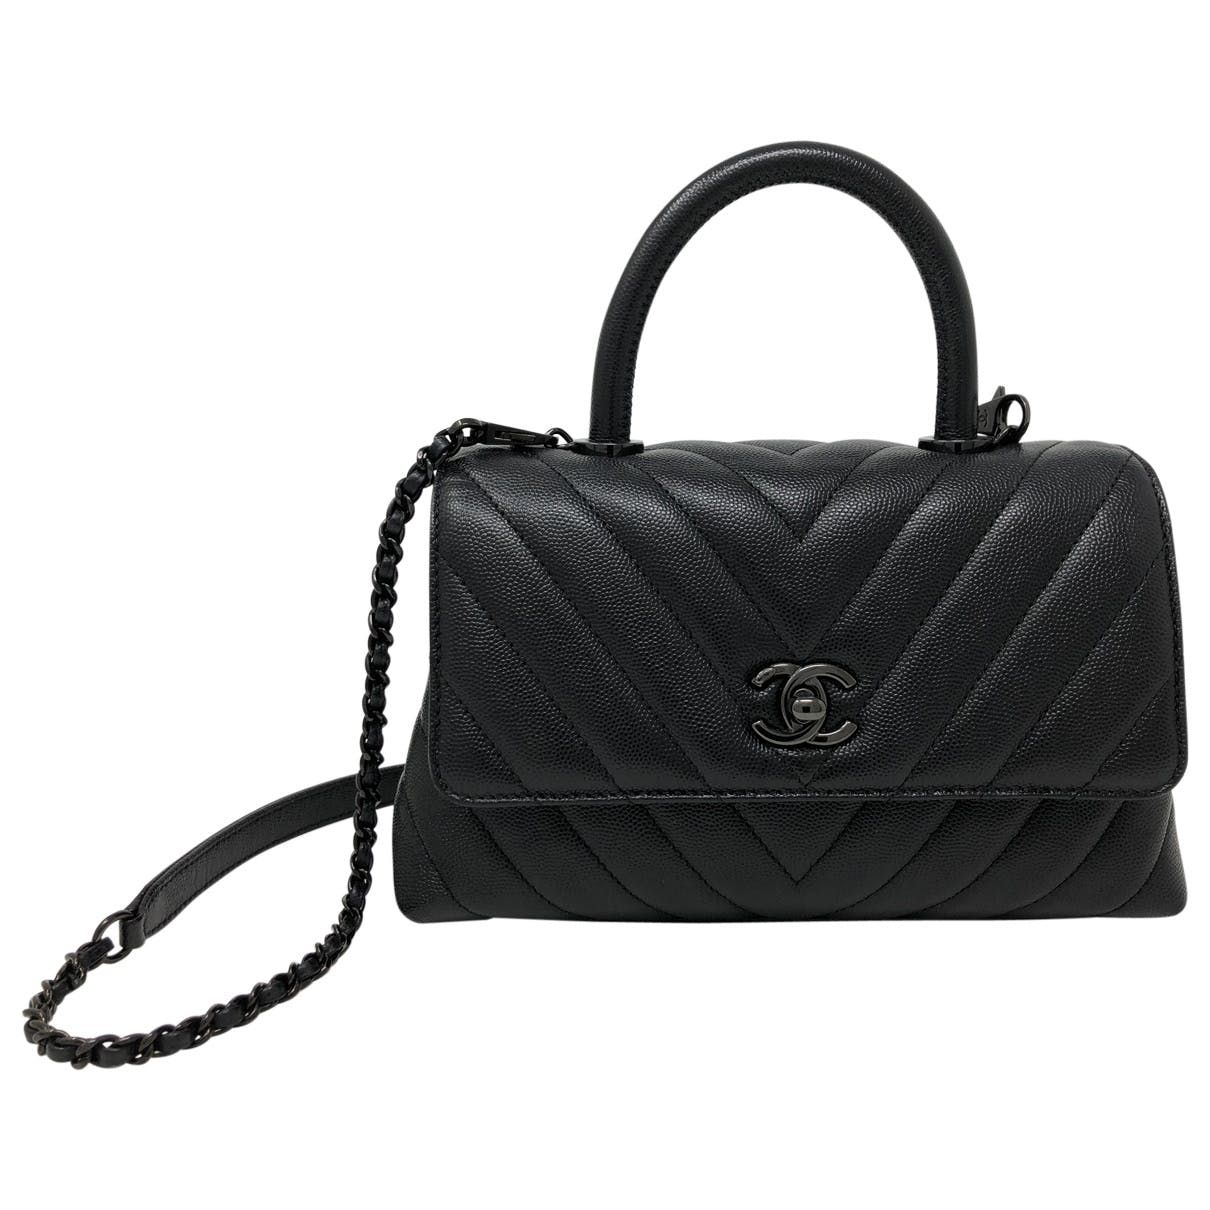 Leather Handbag Chanel Chanel Handbags Chanel Handbags Black Bags